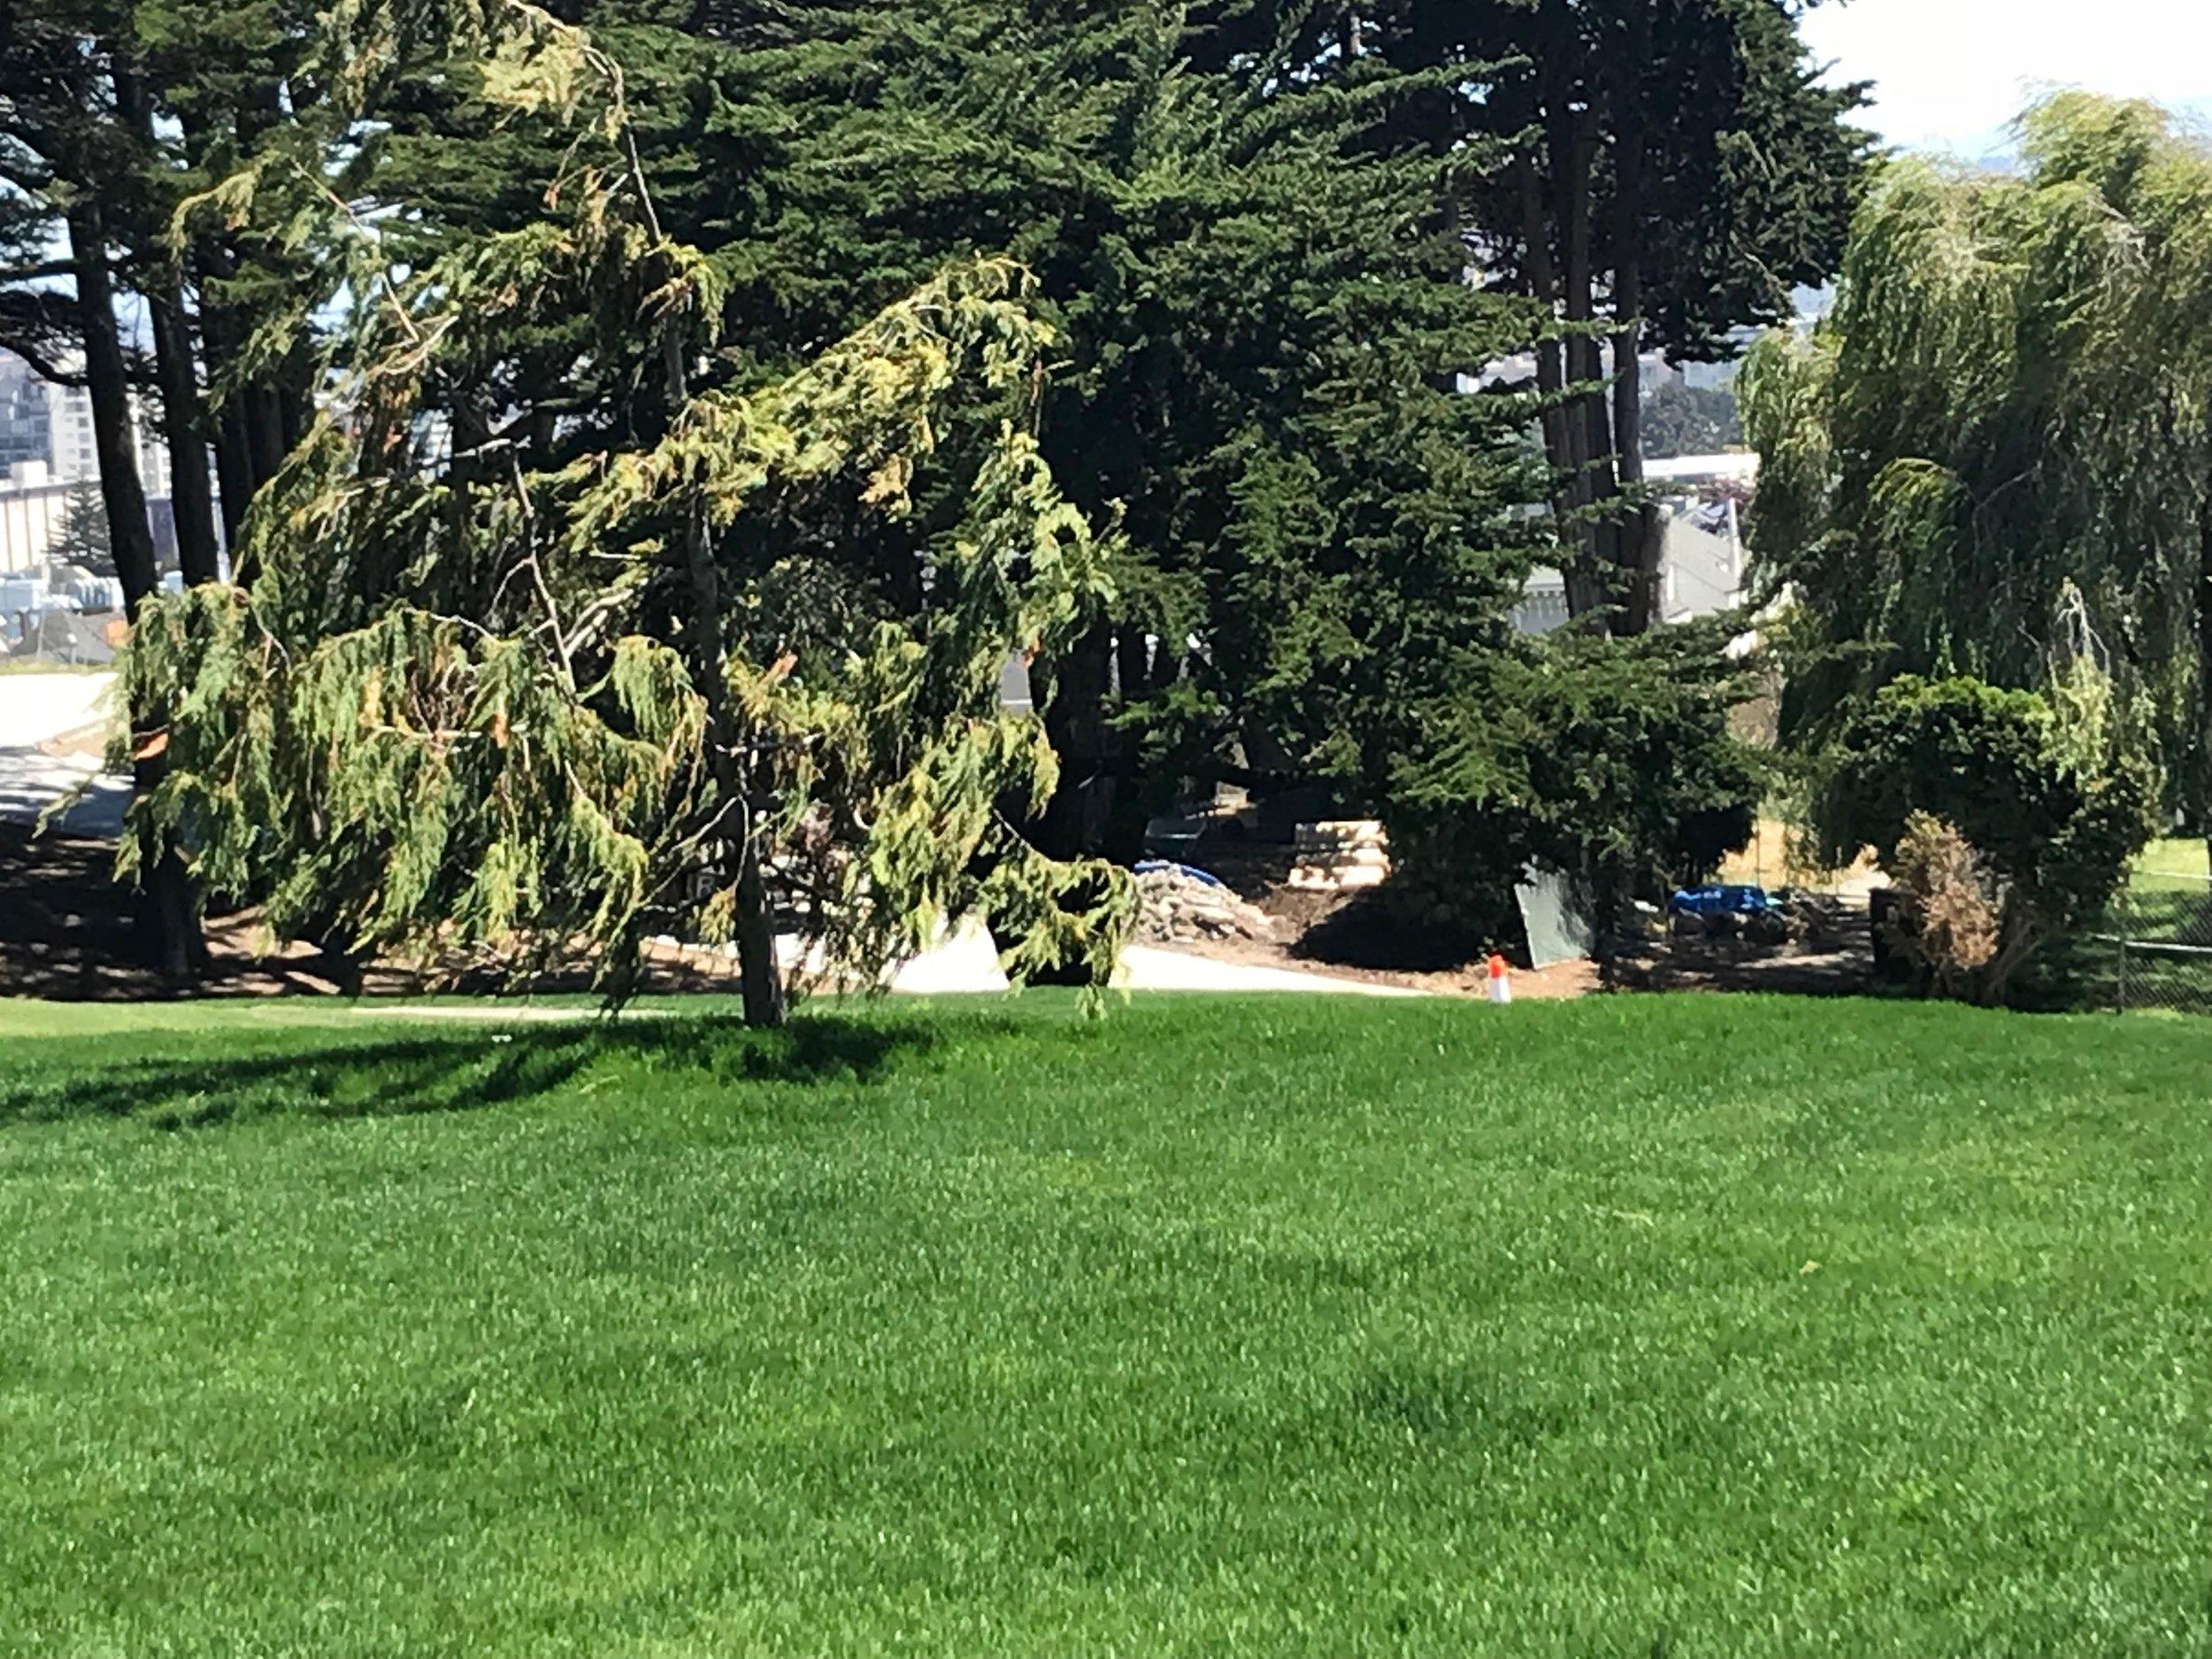 More beautiful grass